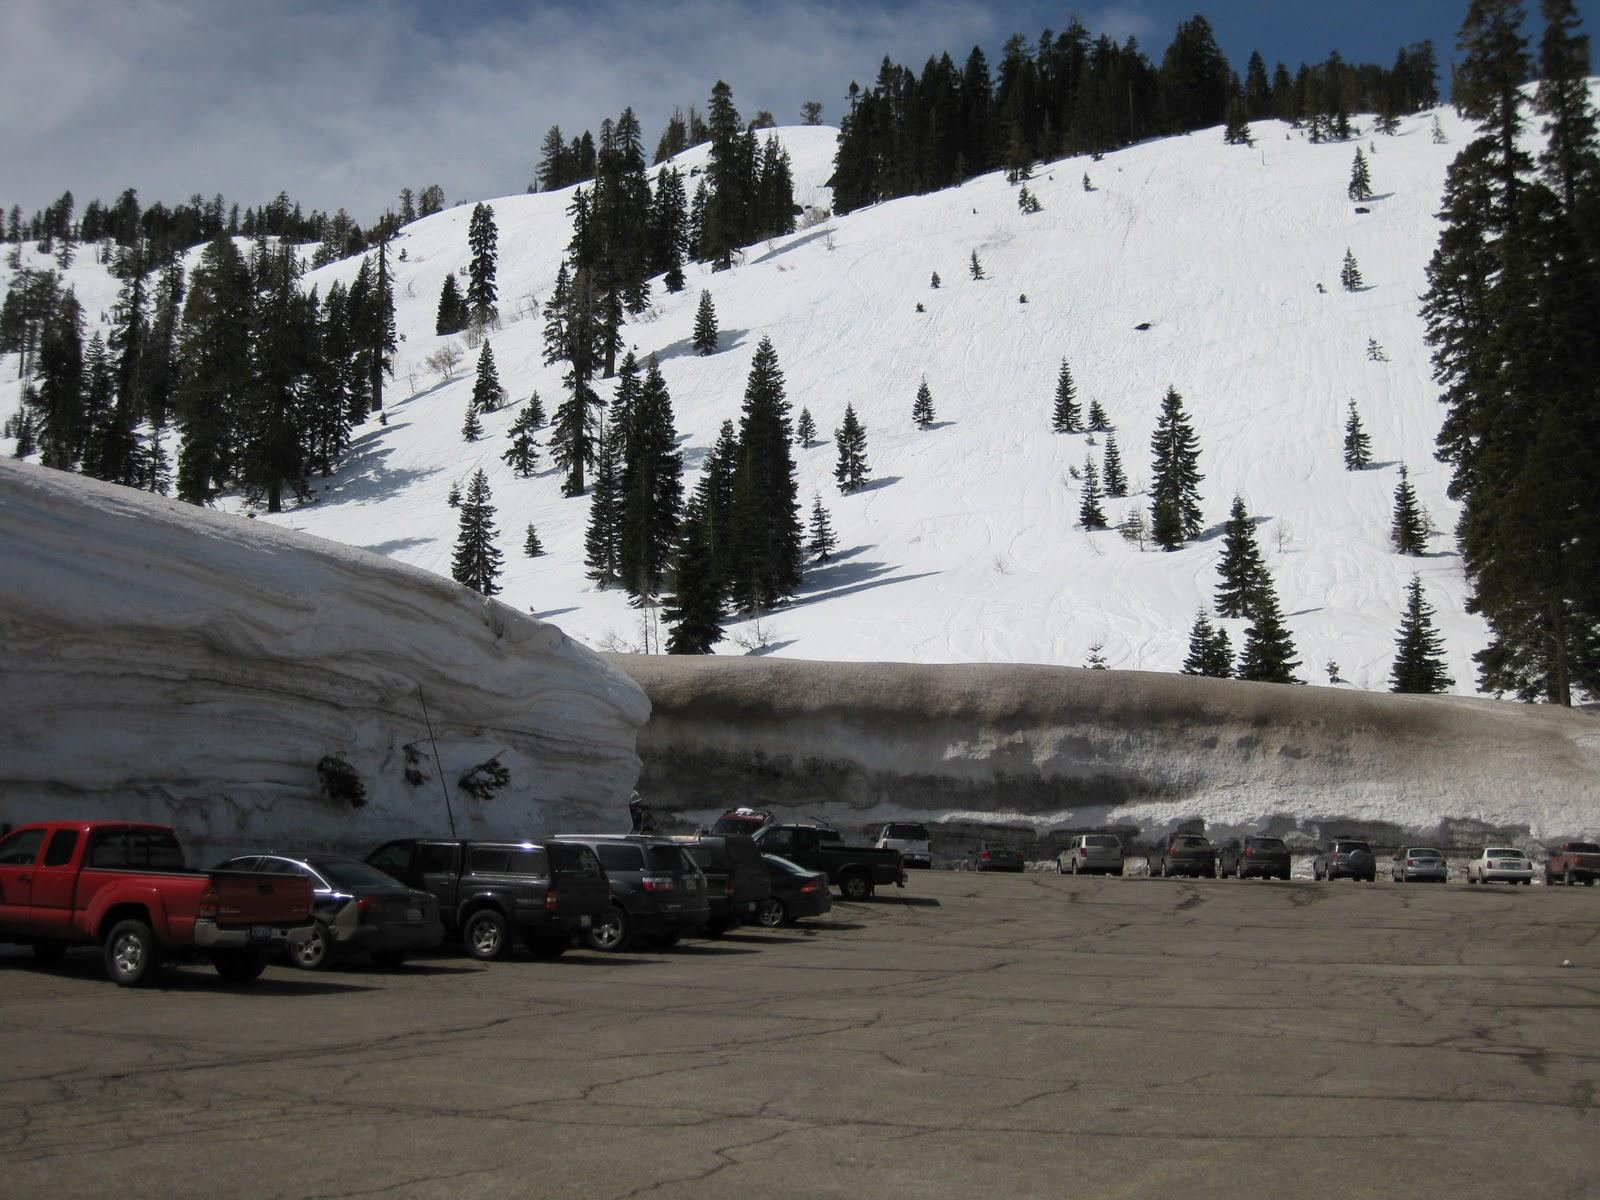 alpine meadows, california, parking lot